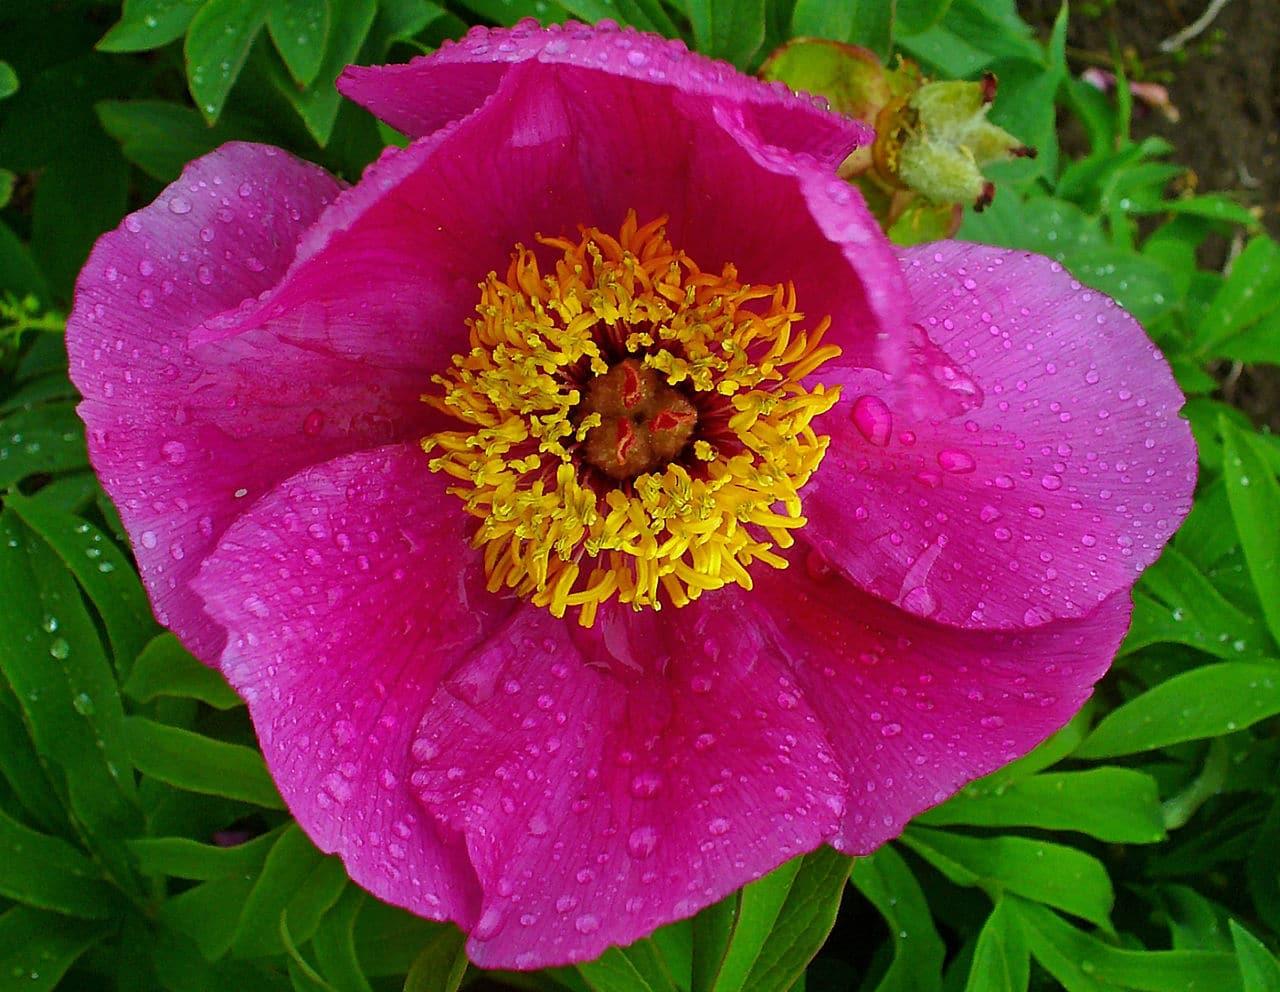 La Paeonia officinalis produce flores rosas